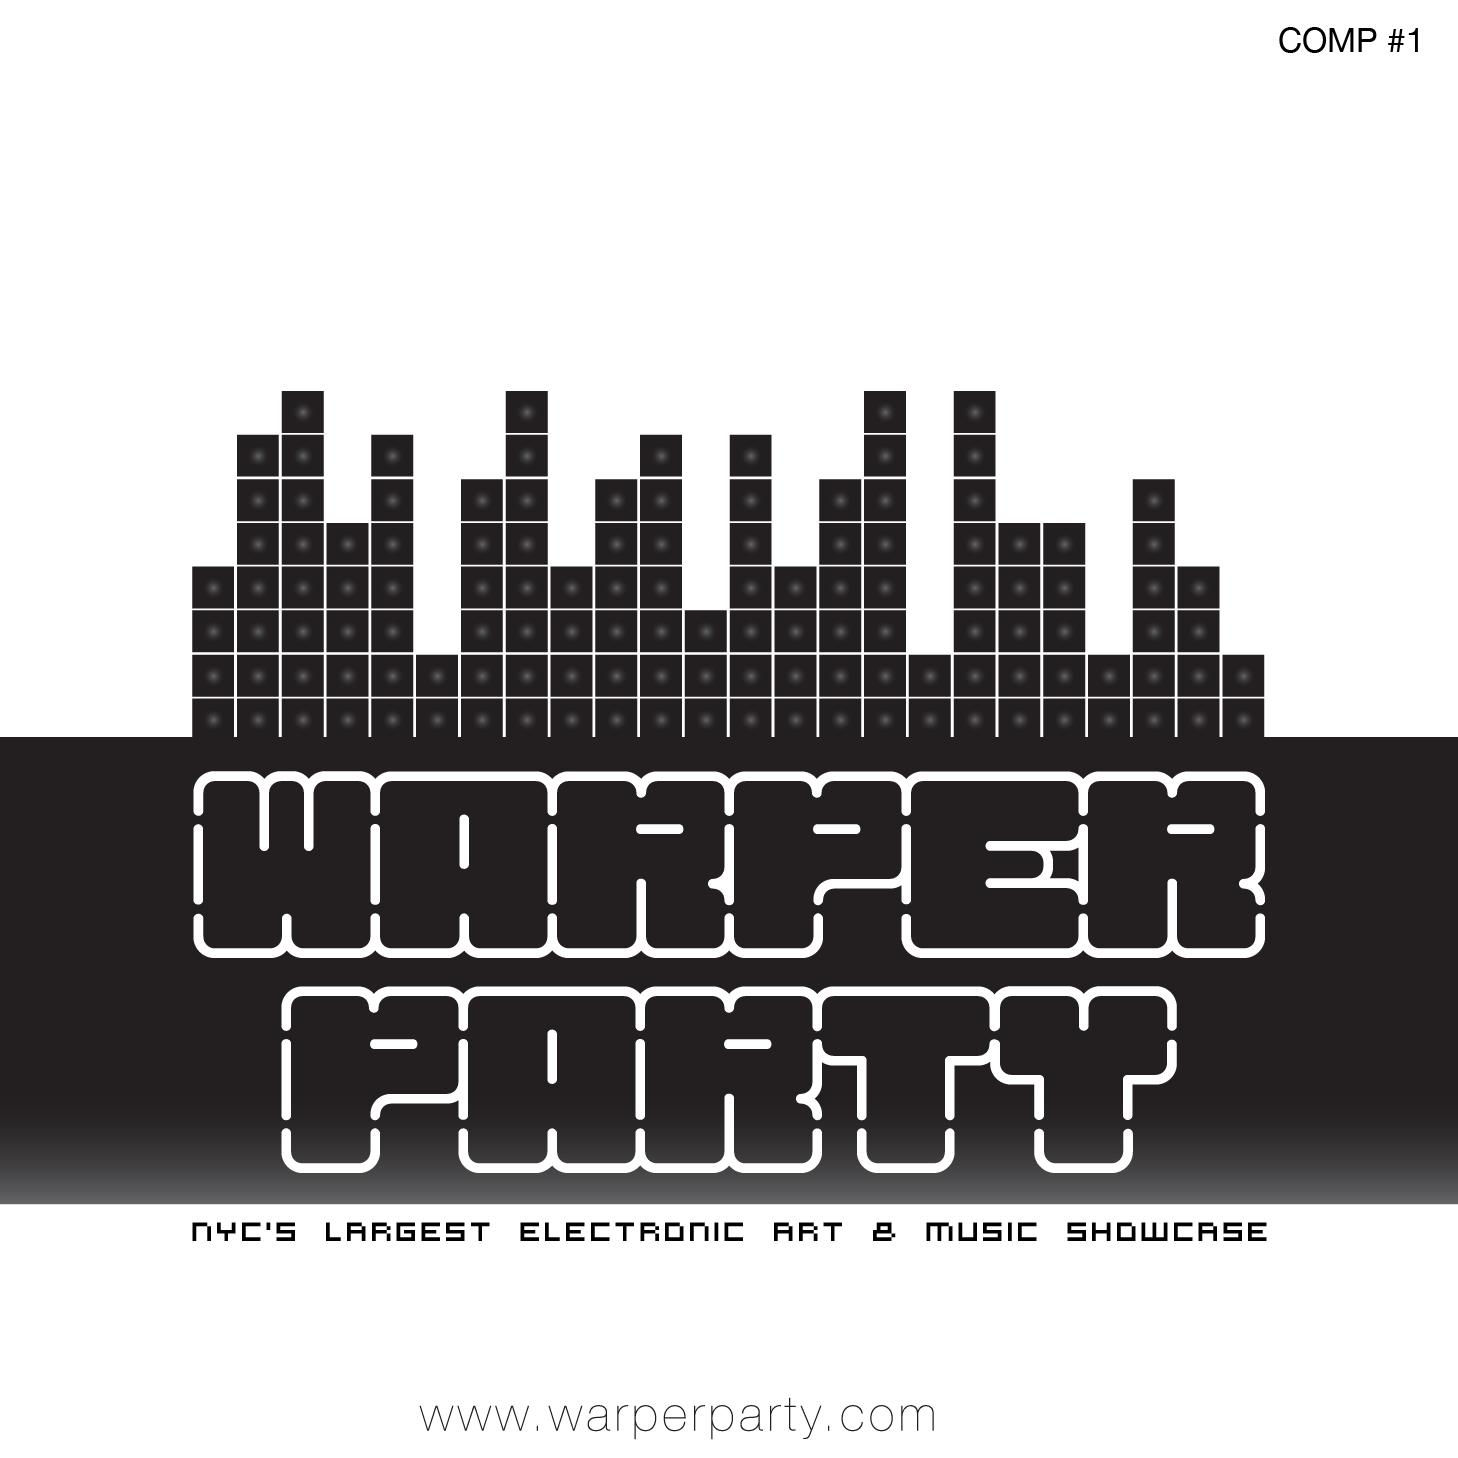 WARPER PARTY COMPILLATION